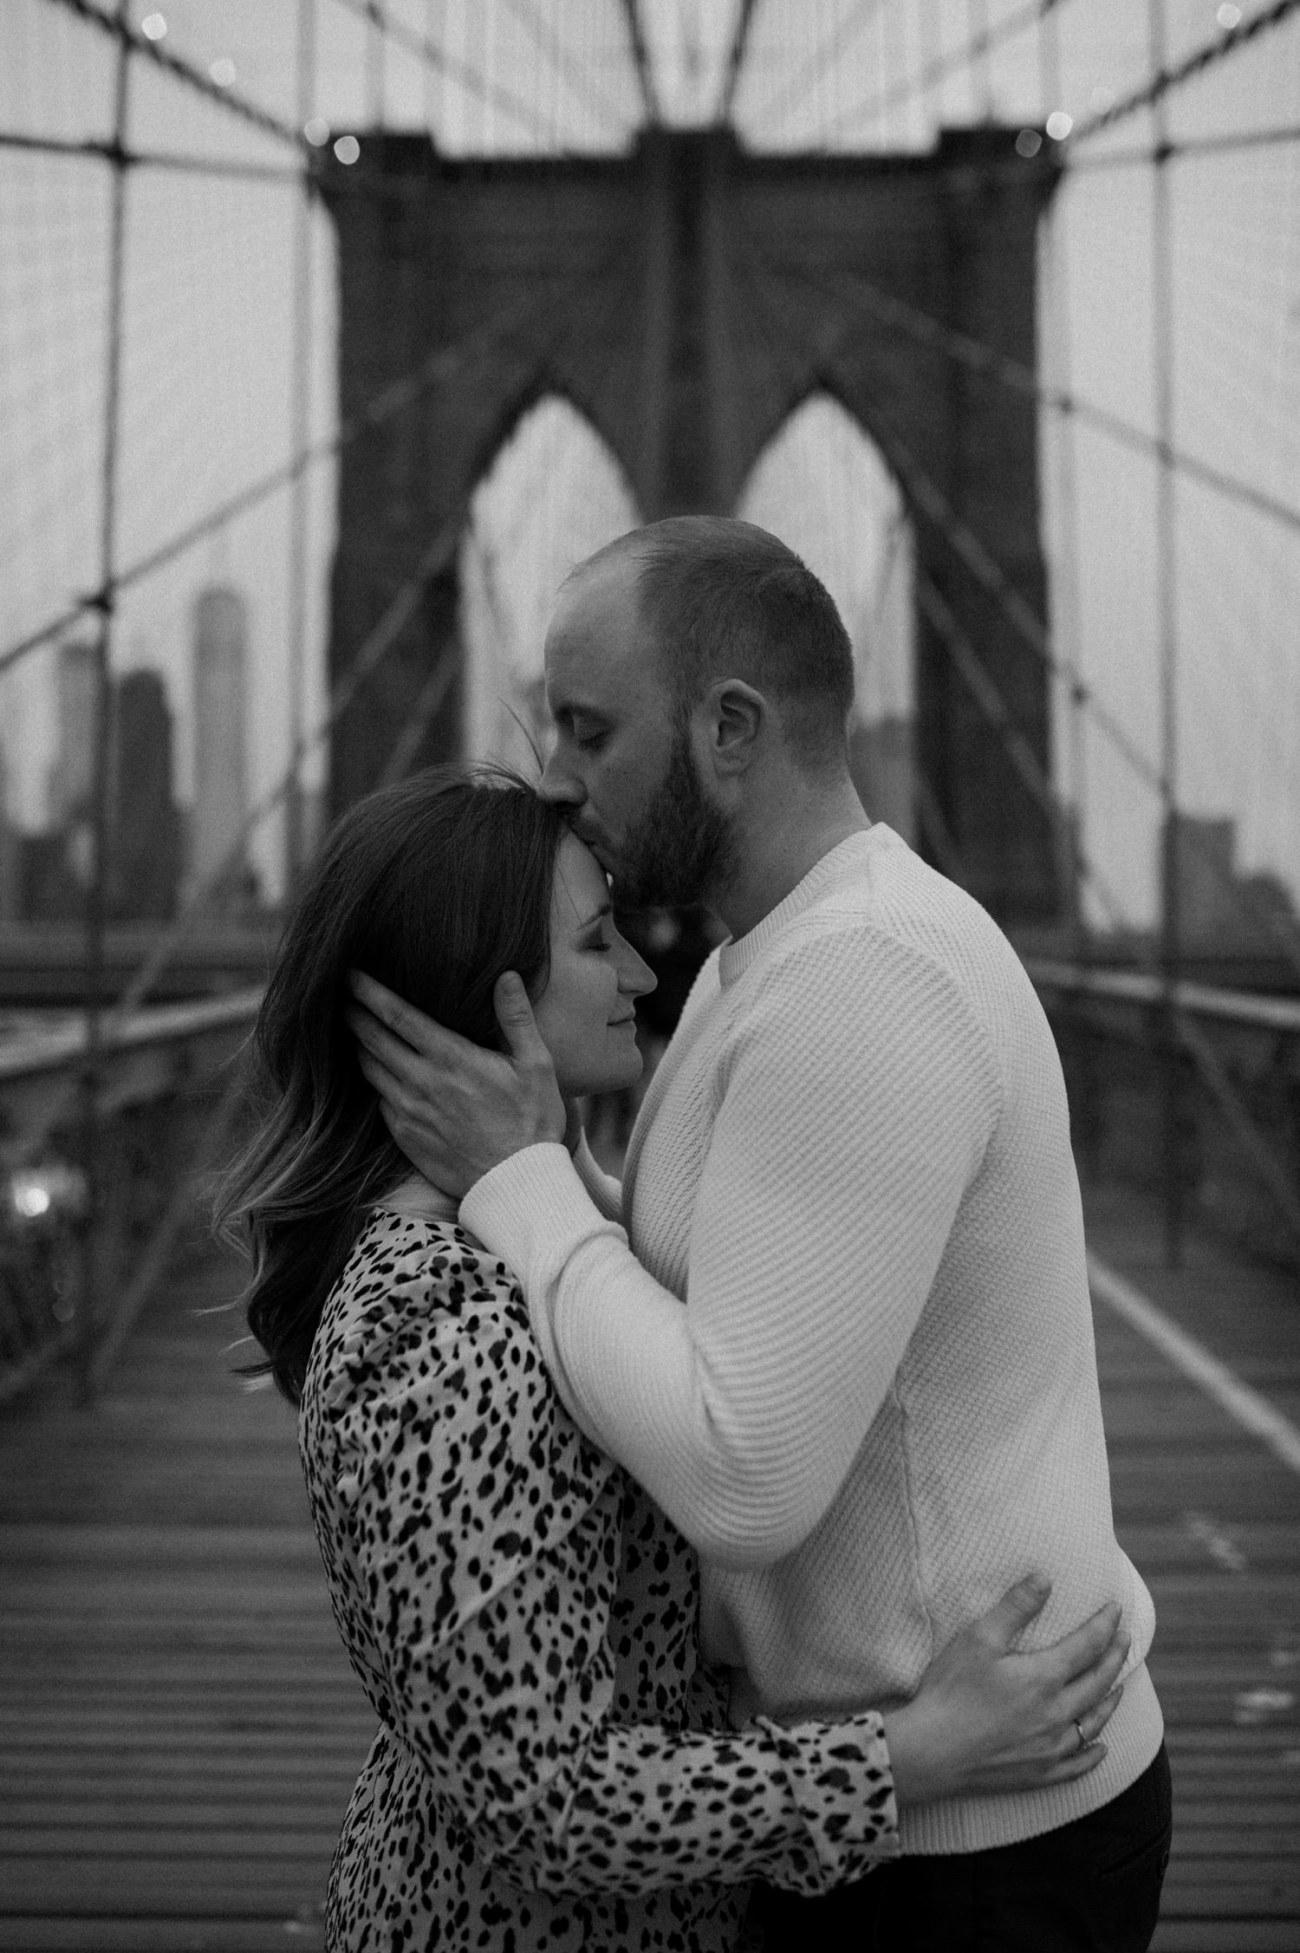 Brooklyn Bridge Engagement Photos Brooklyn Dumbo Couple Session NYC Wedding Photographer Anais Possamai Photography 10